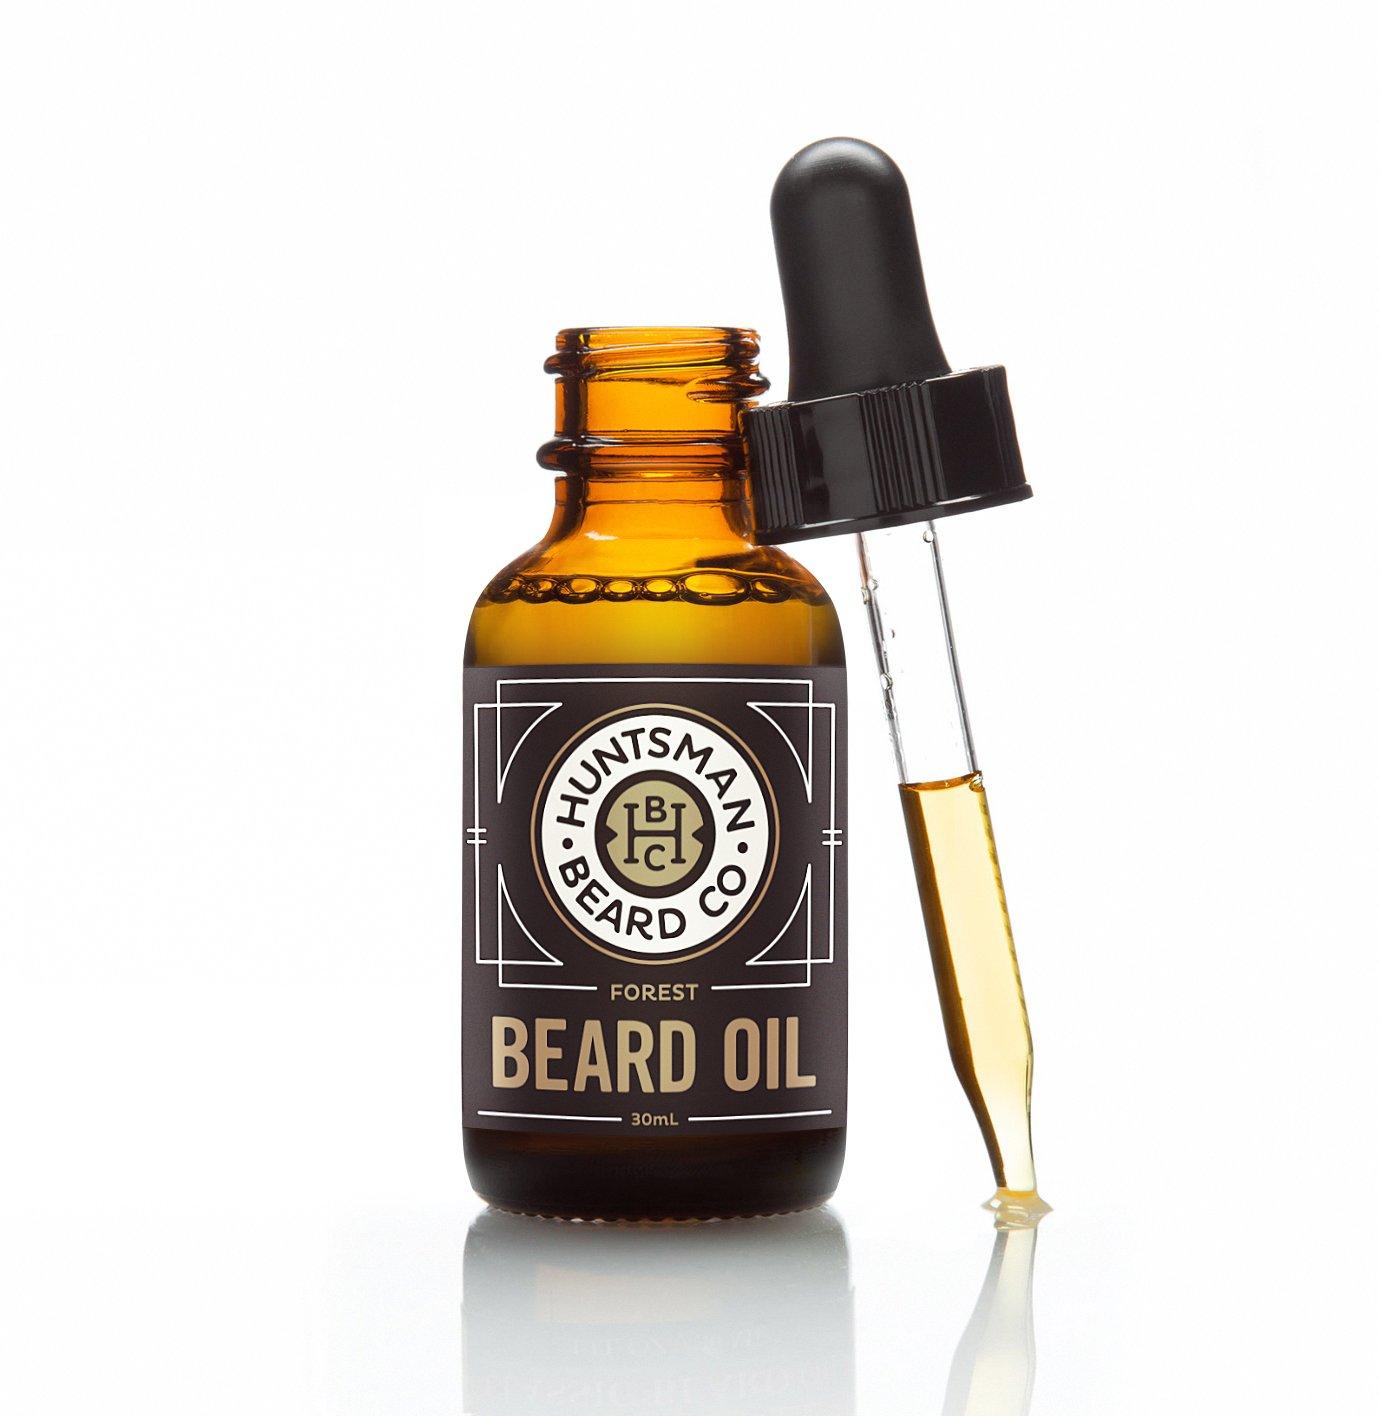 best beard trimmer 2016 top 7 beard trimmer reviews. Black Bedroom Furniture Sets. Home Design Ideas